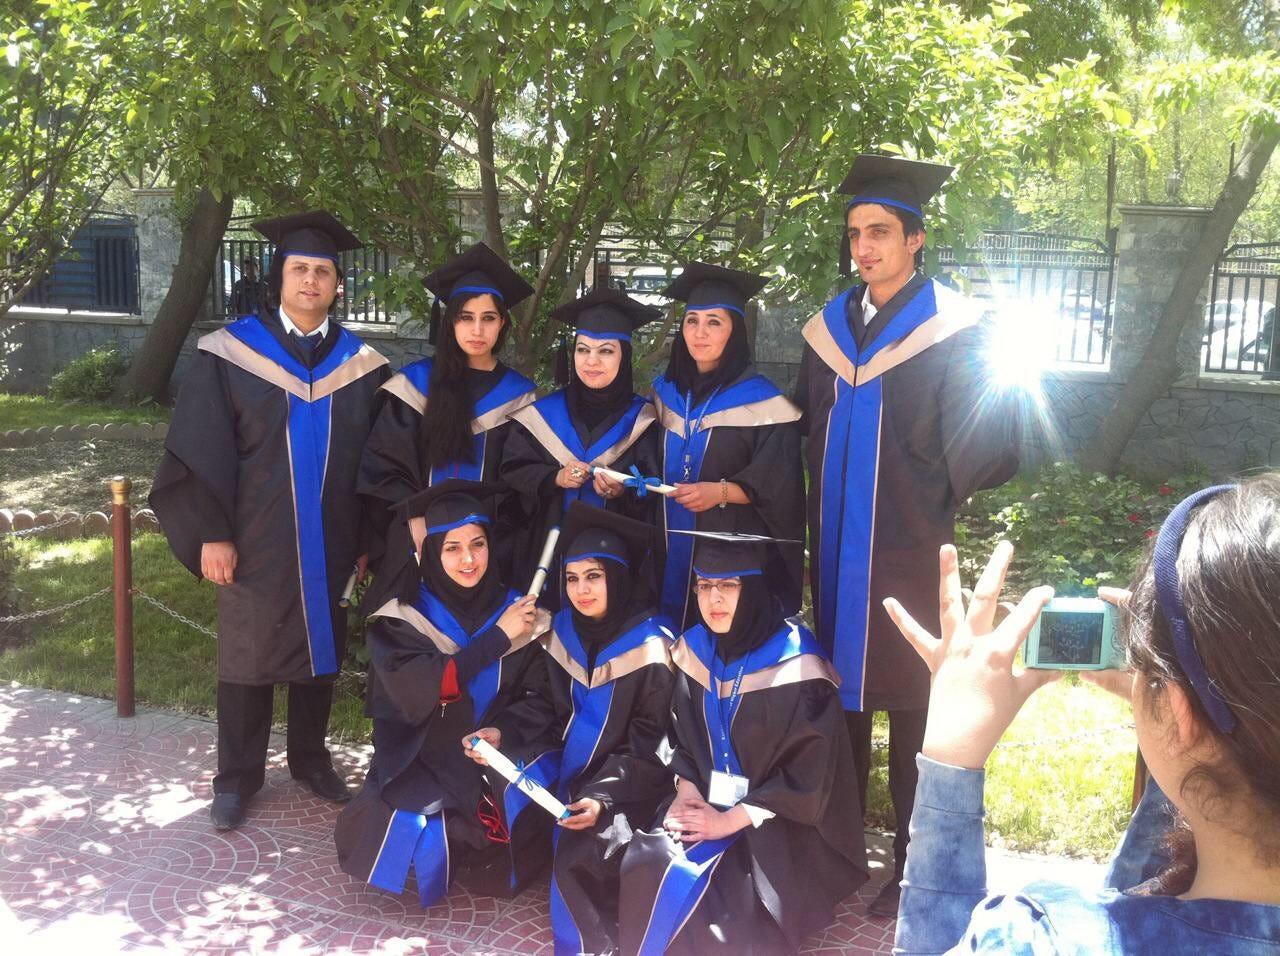 Zalmay Niazy, right, after graduating from Kardan University in Kabul, Afghanistan.